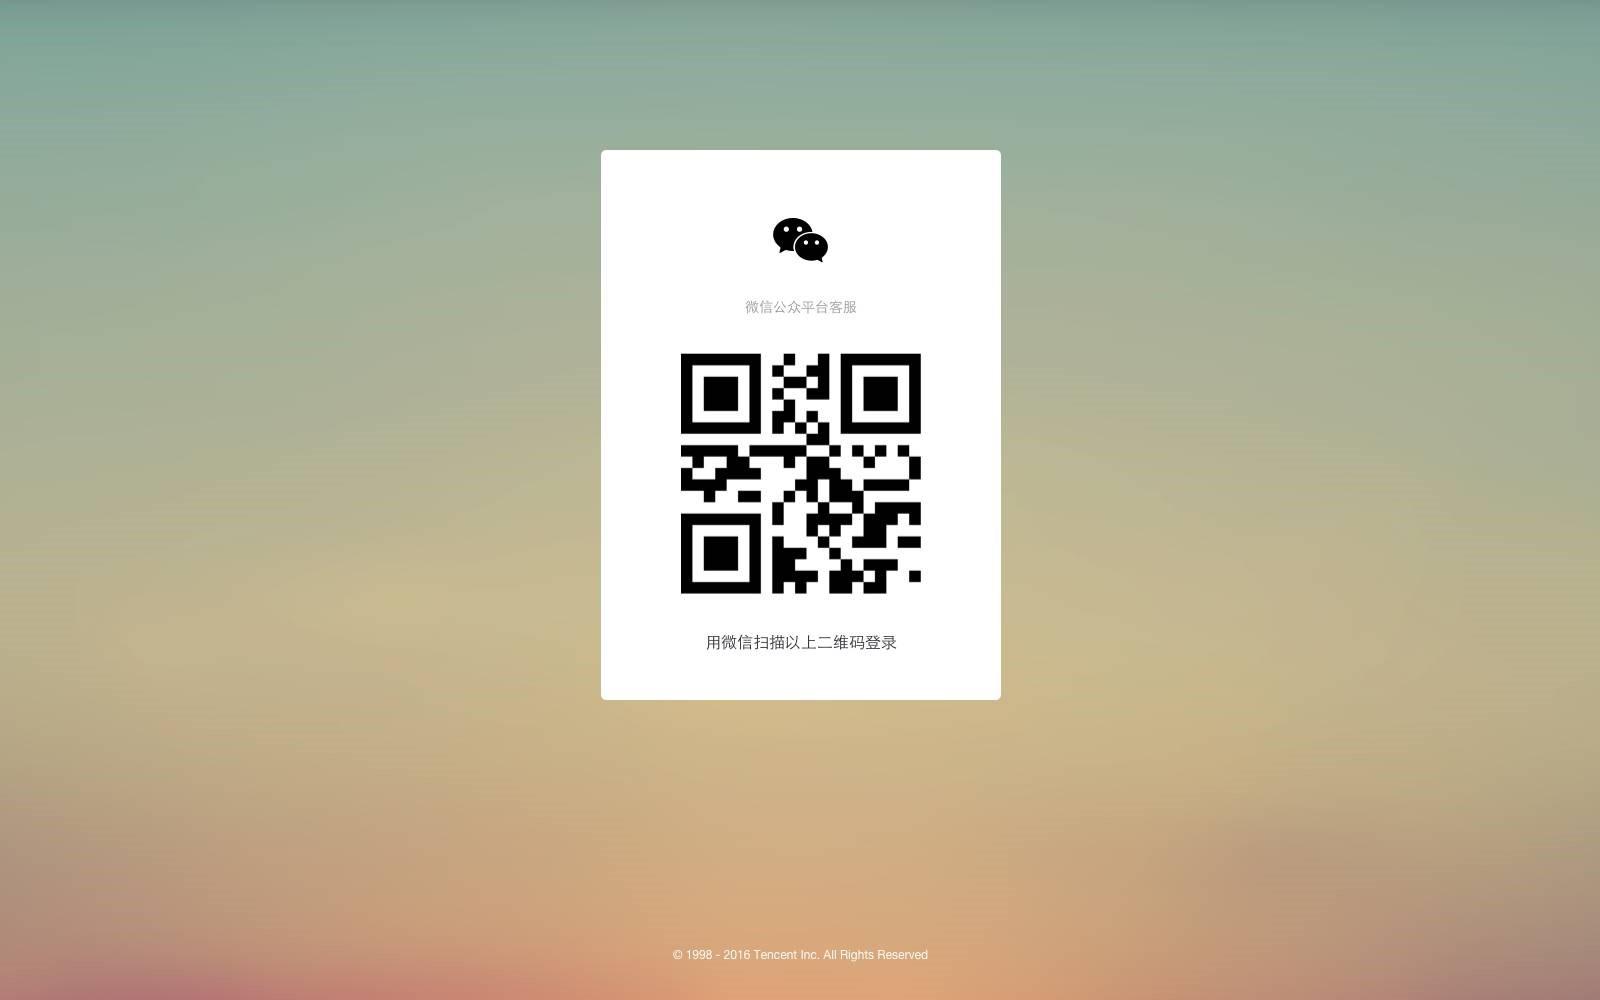 images/5/2016/05/P4mPIO2mbMpG2MQoGLoM326OlbmZm6.jpg